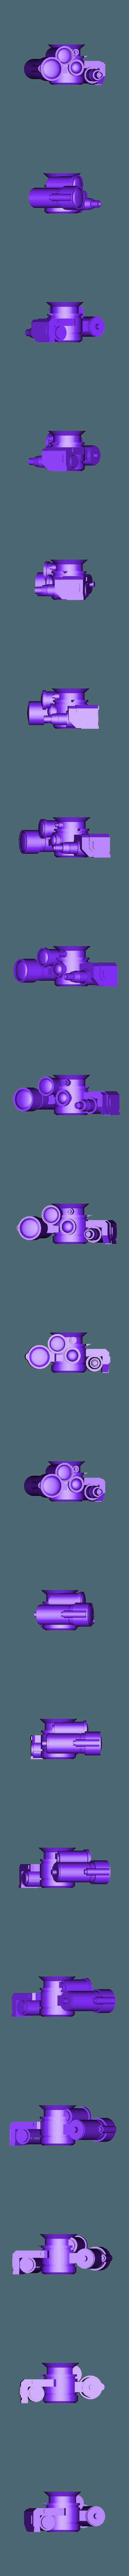 10Storm_Surge_gun_pod_sensors.obj Download free OBJ file Tempest Rush Mech • 3D printer model, Leesedrenfort